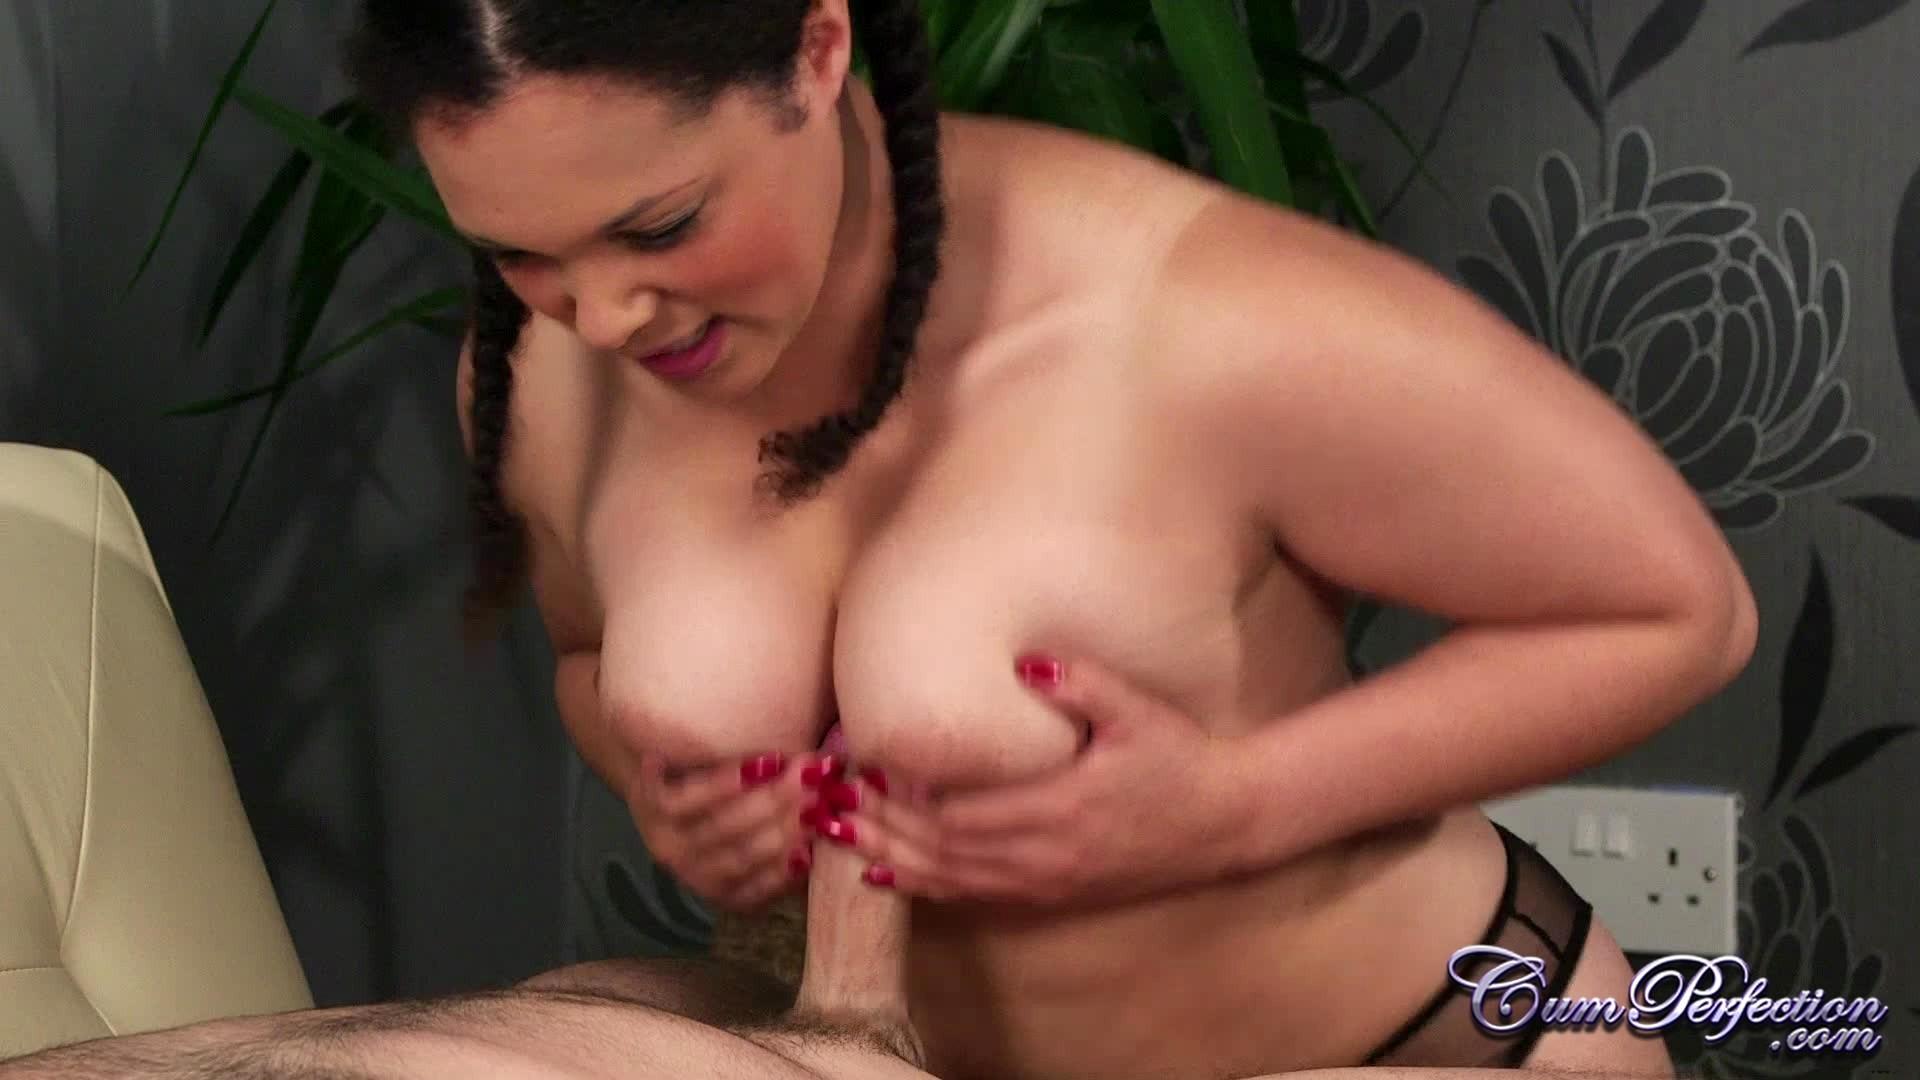 Natalia Kloe Porno kloe webcam | www.freee-porns